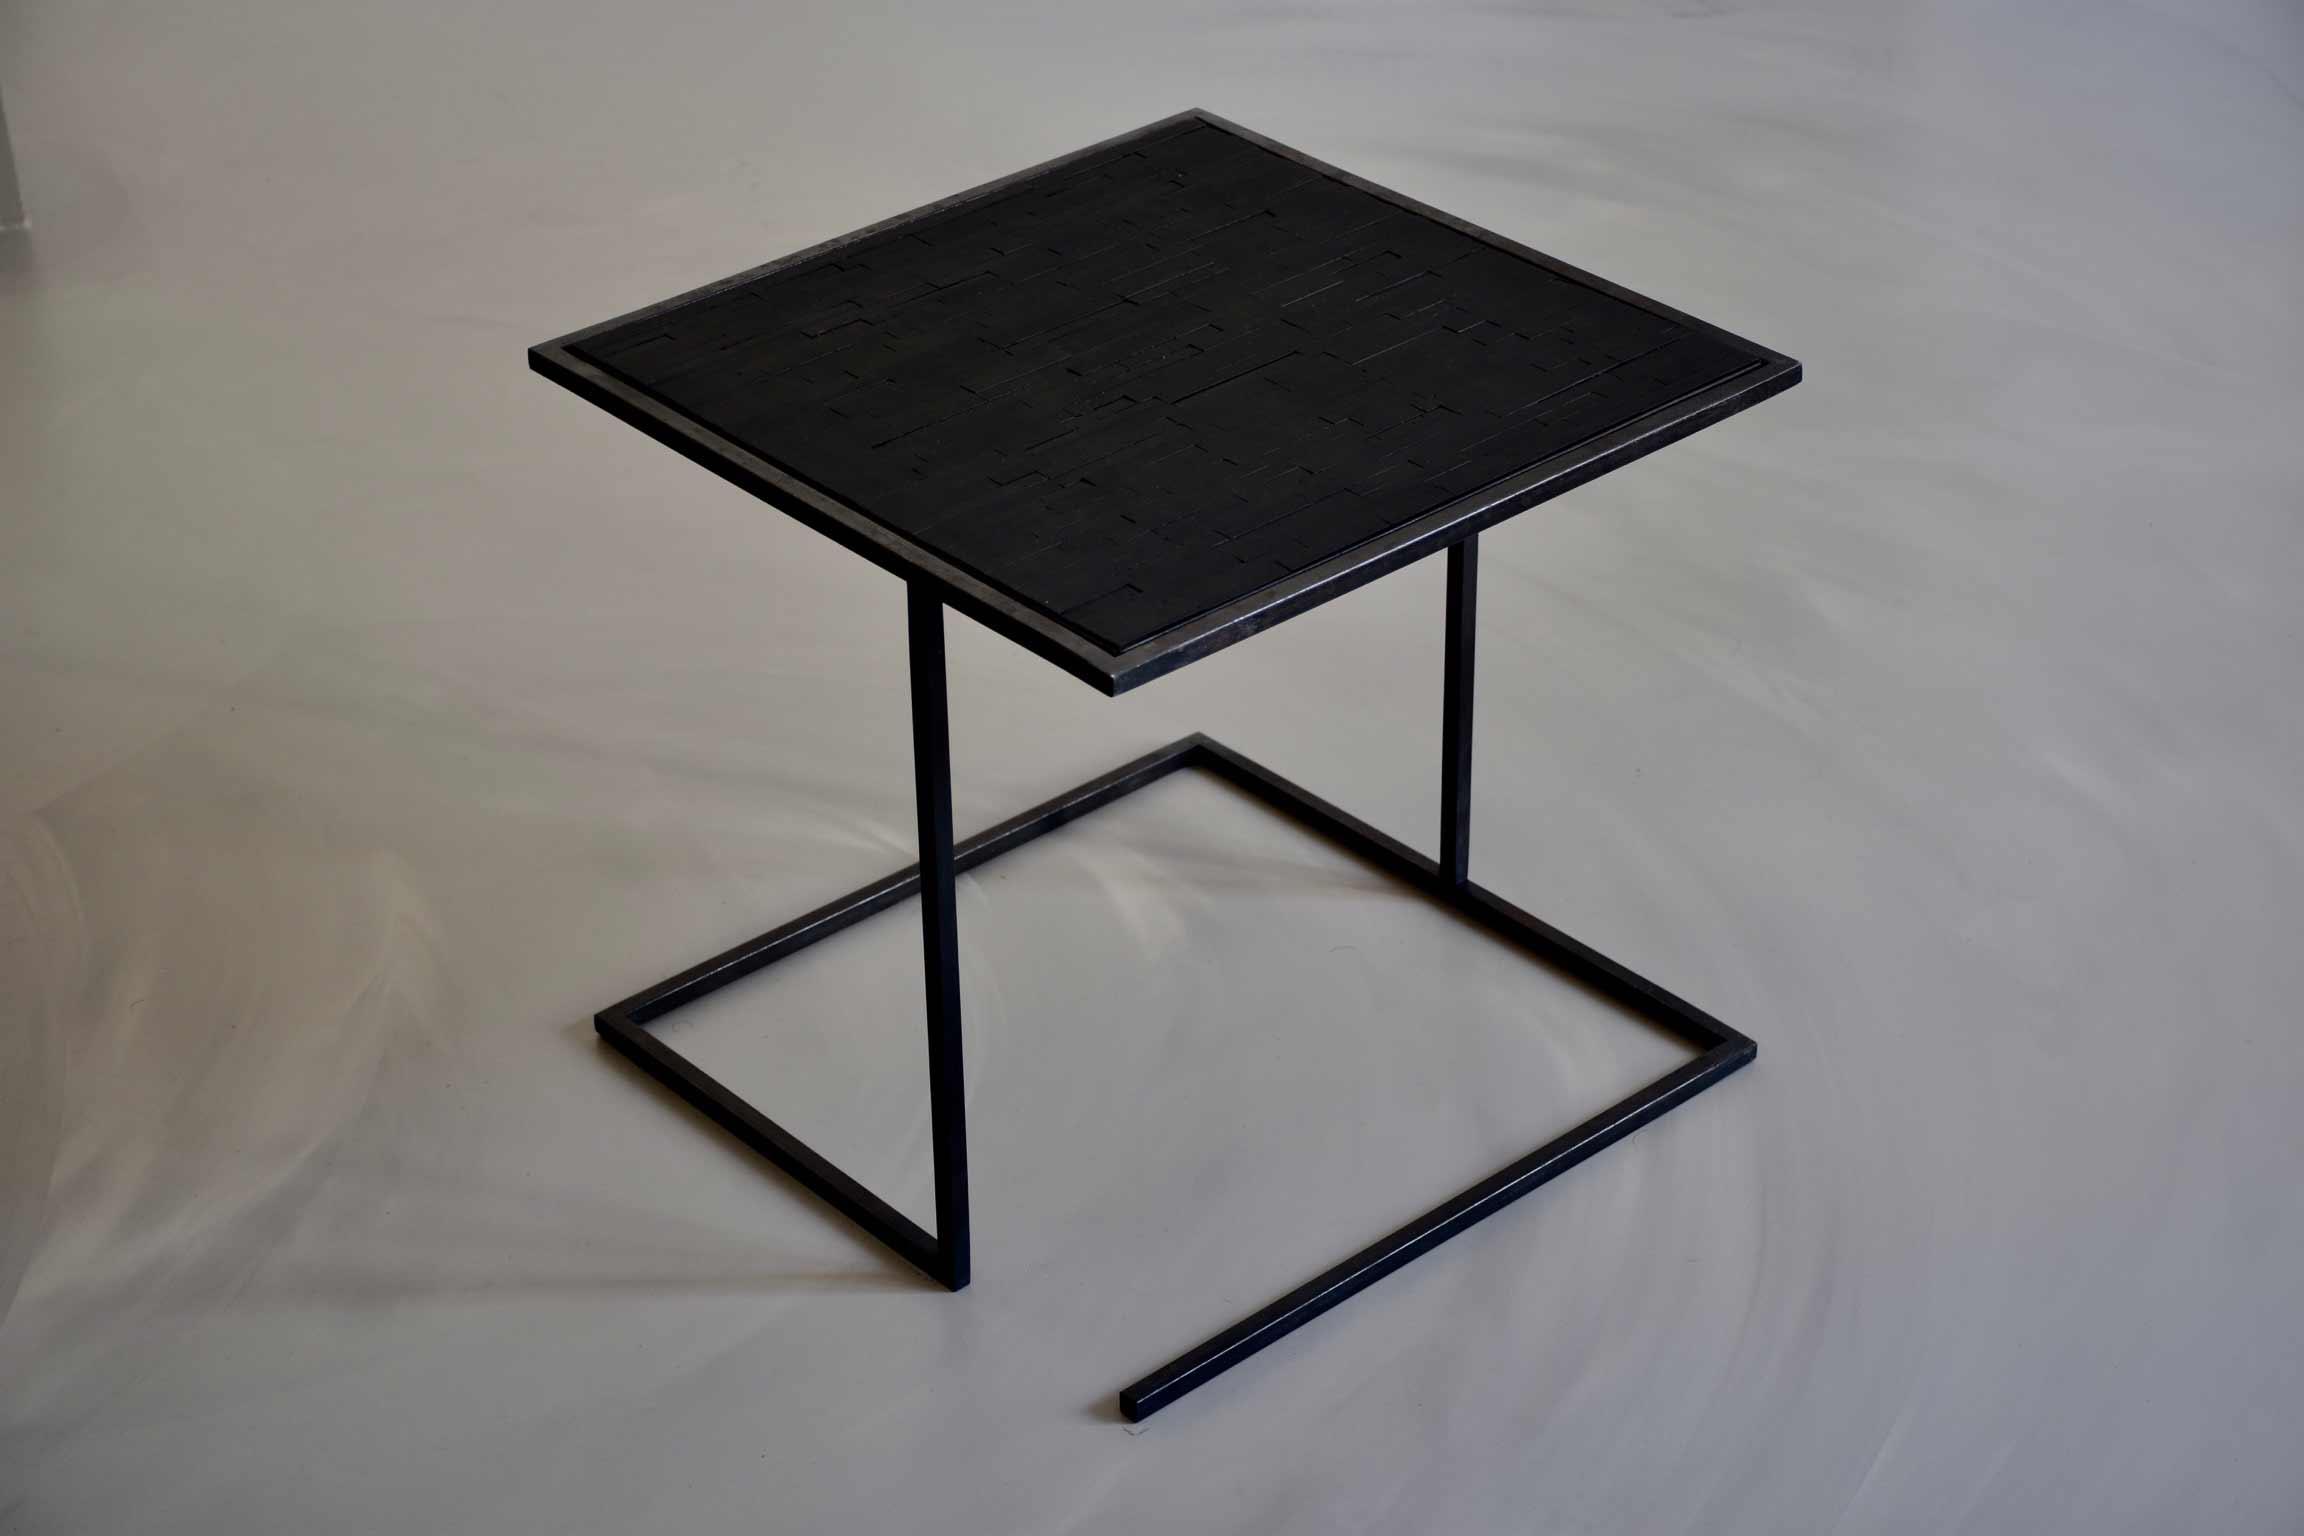 andrea-design-tafels-hout-zwart-2.jpg